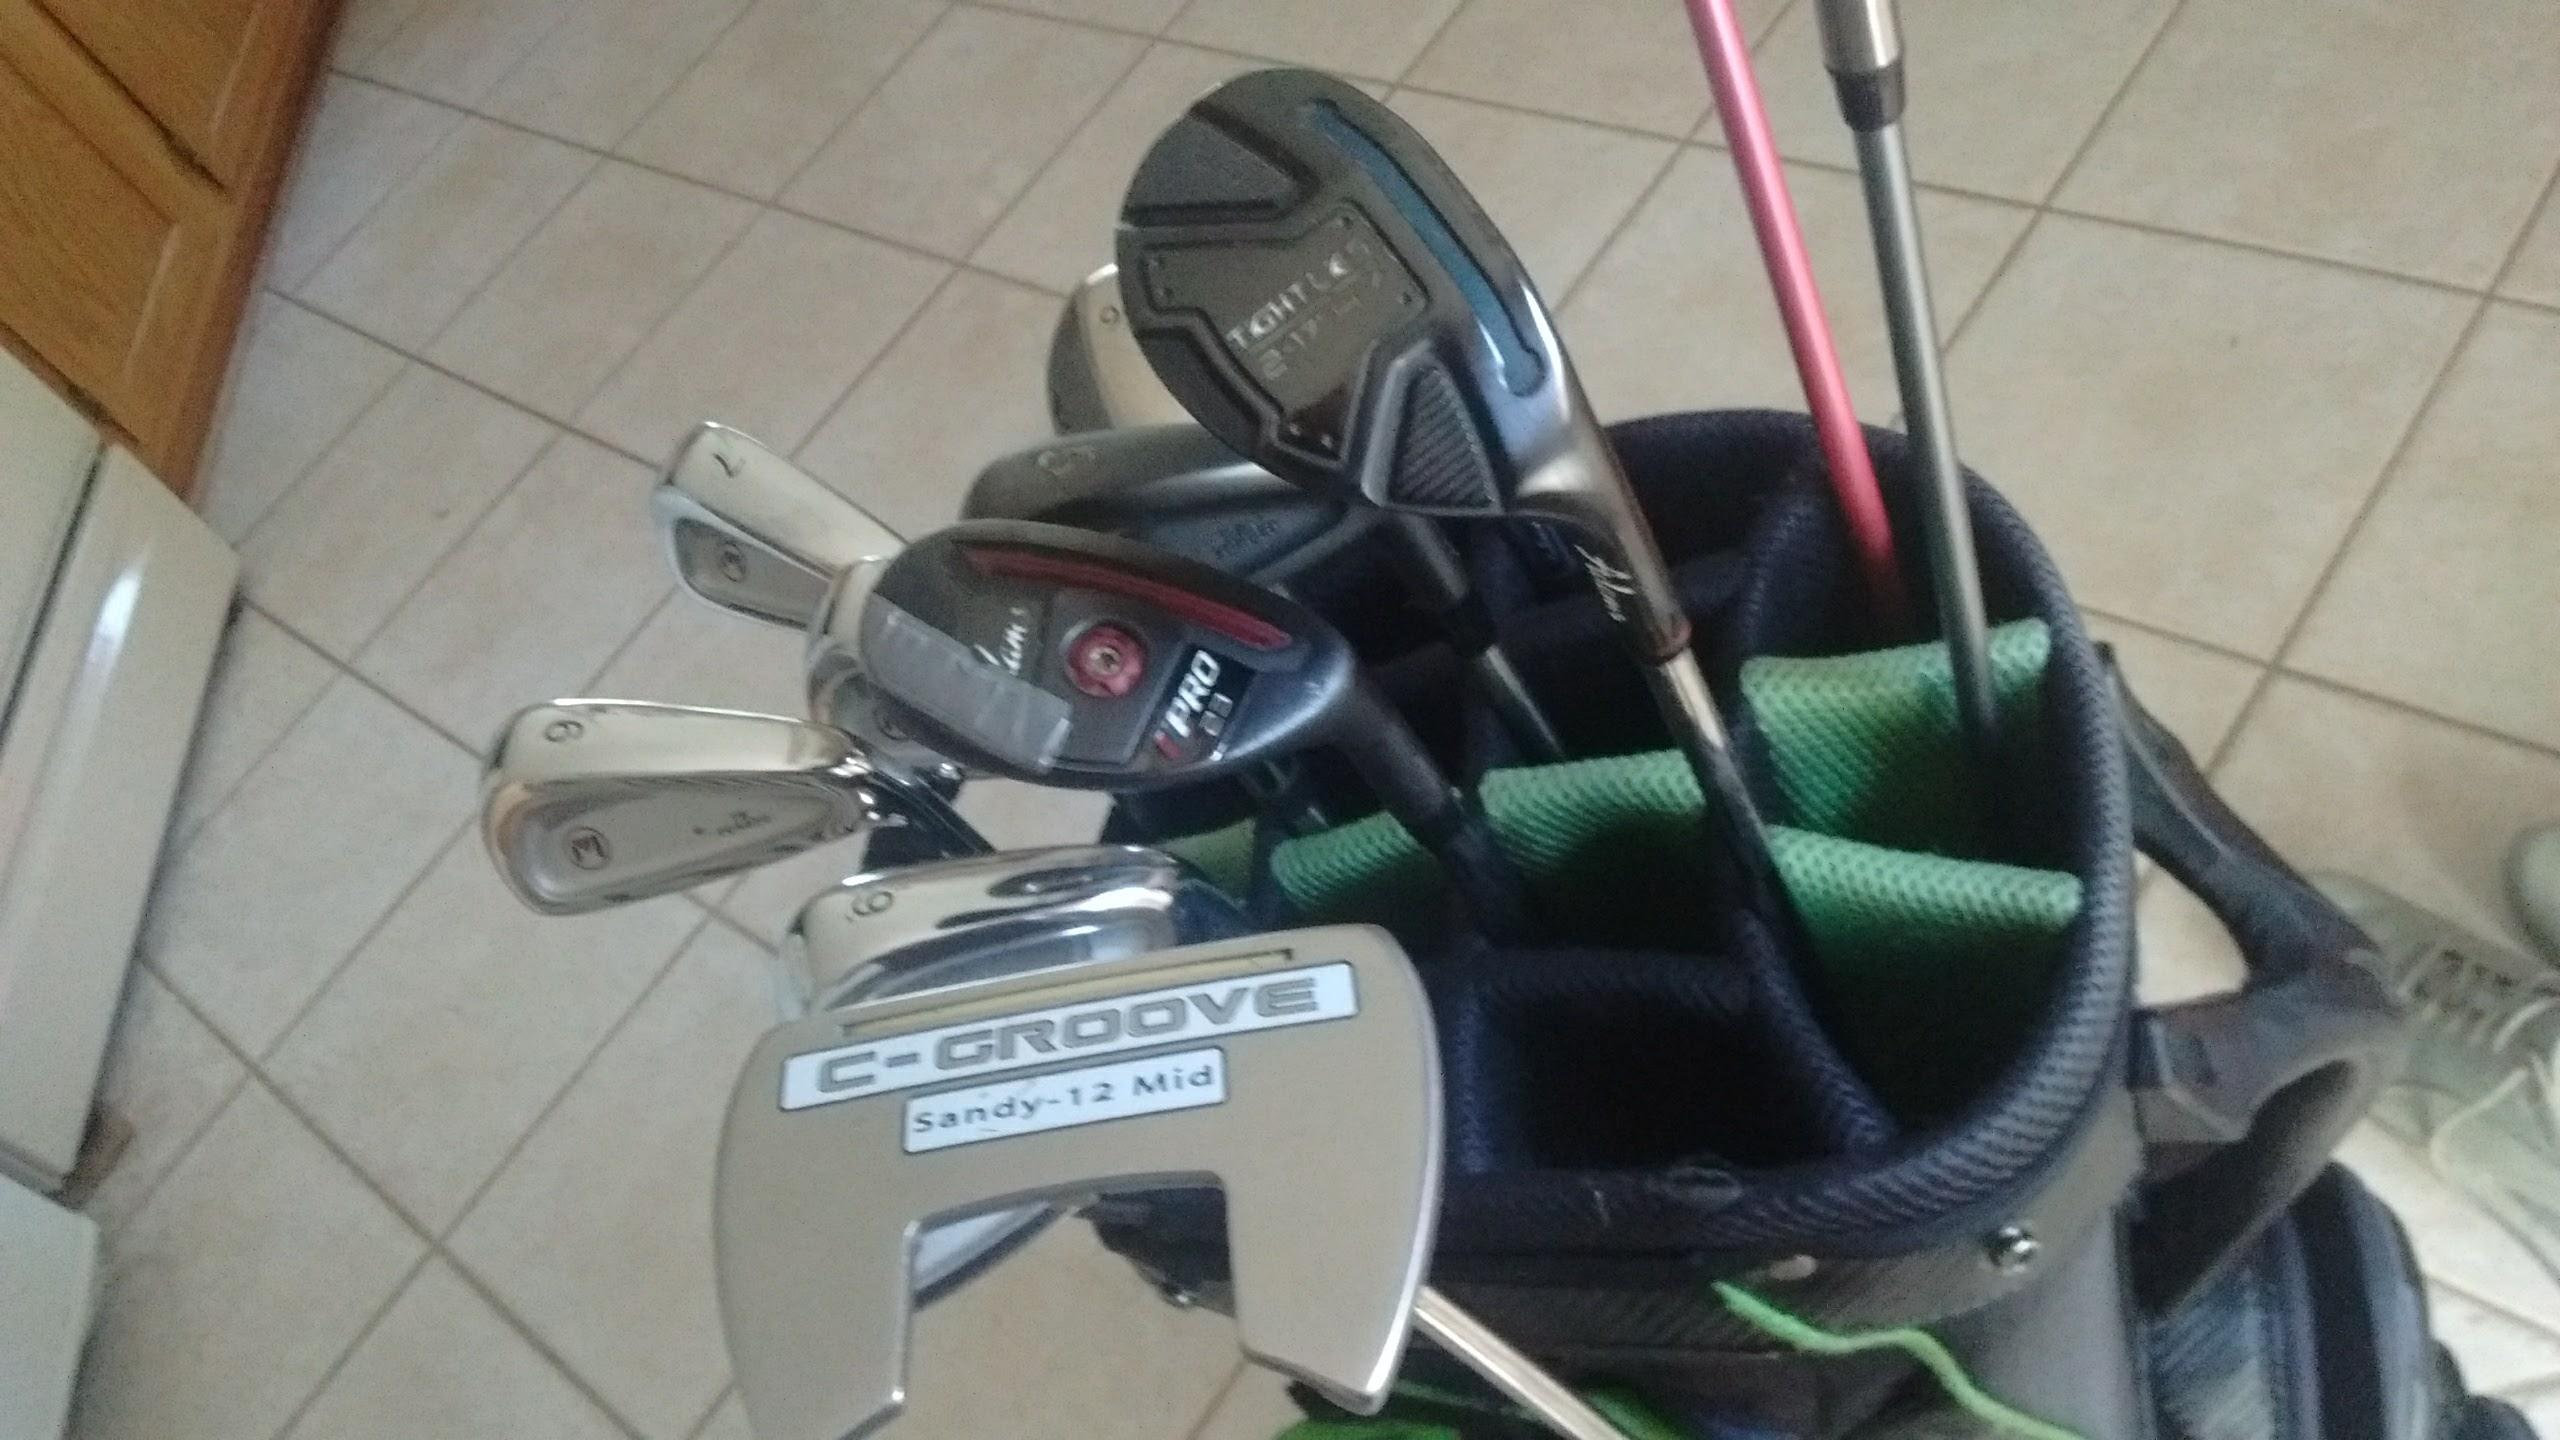 image http://www.golfbuzz.com/assets/images/108-srdNOKug9WhohWp1.jpeg